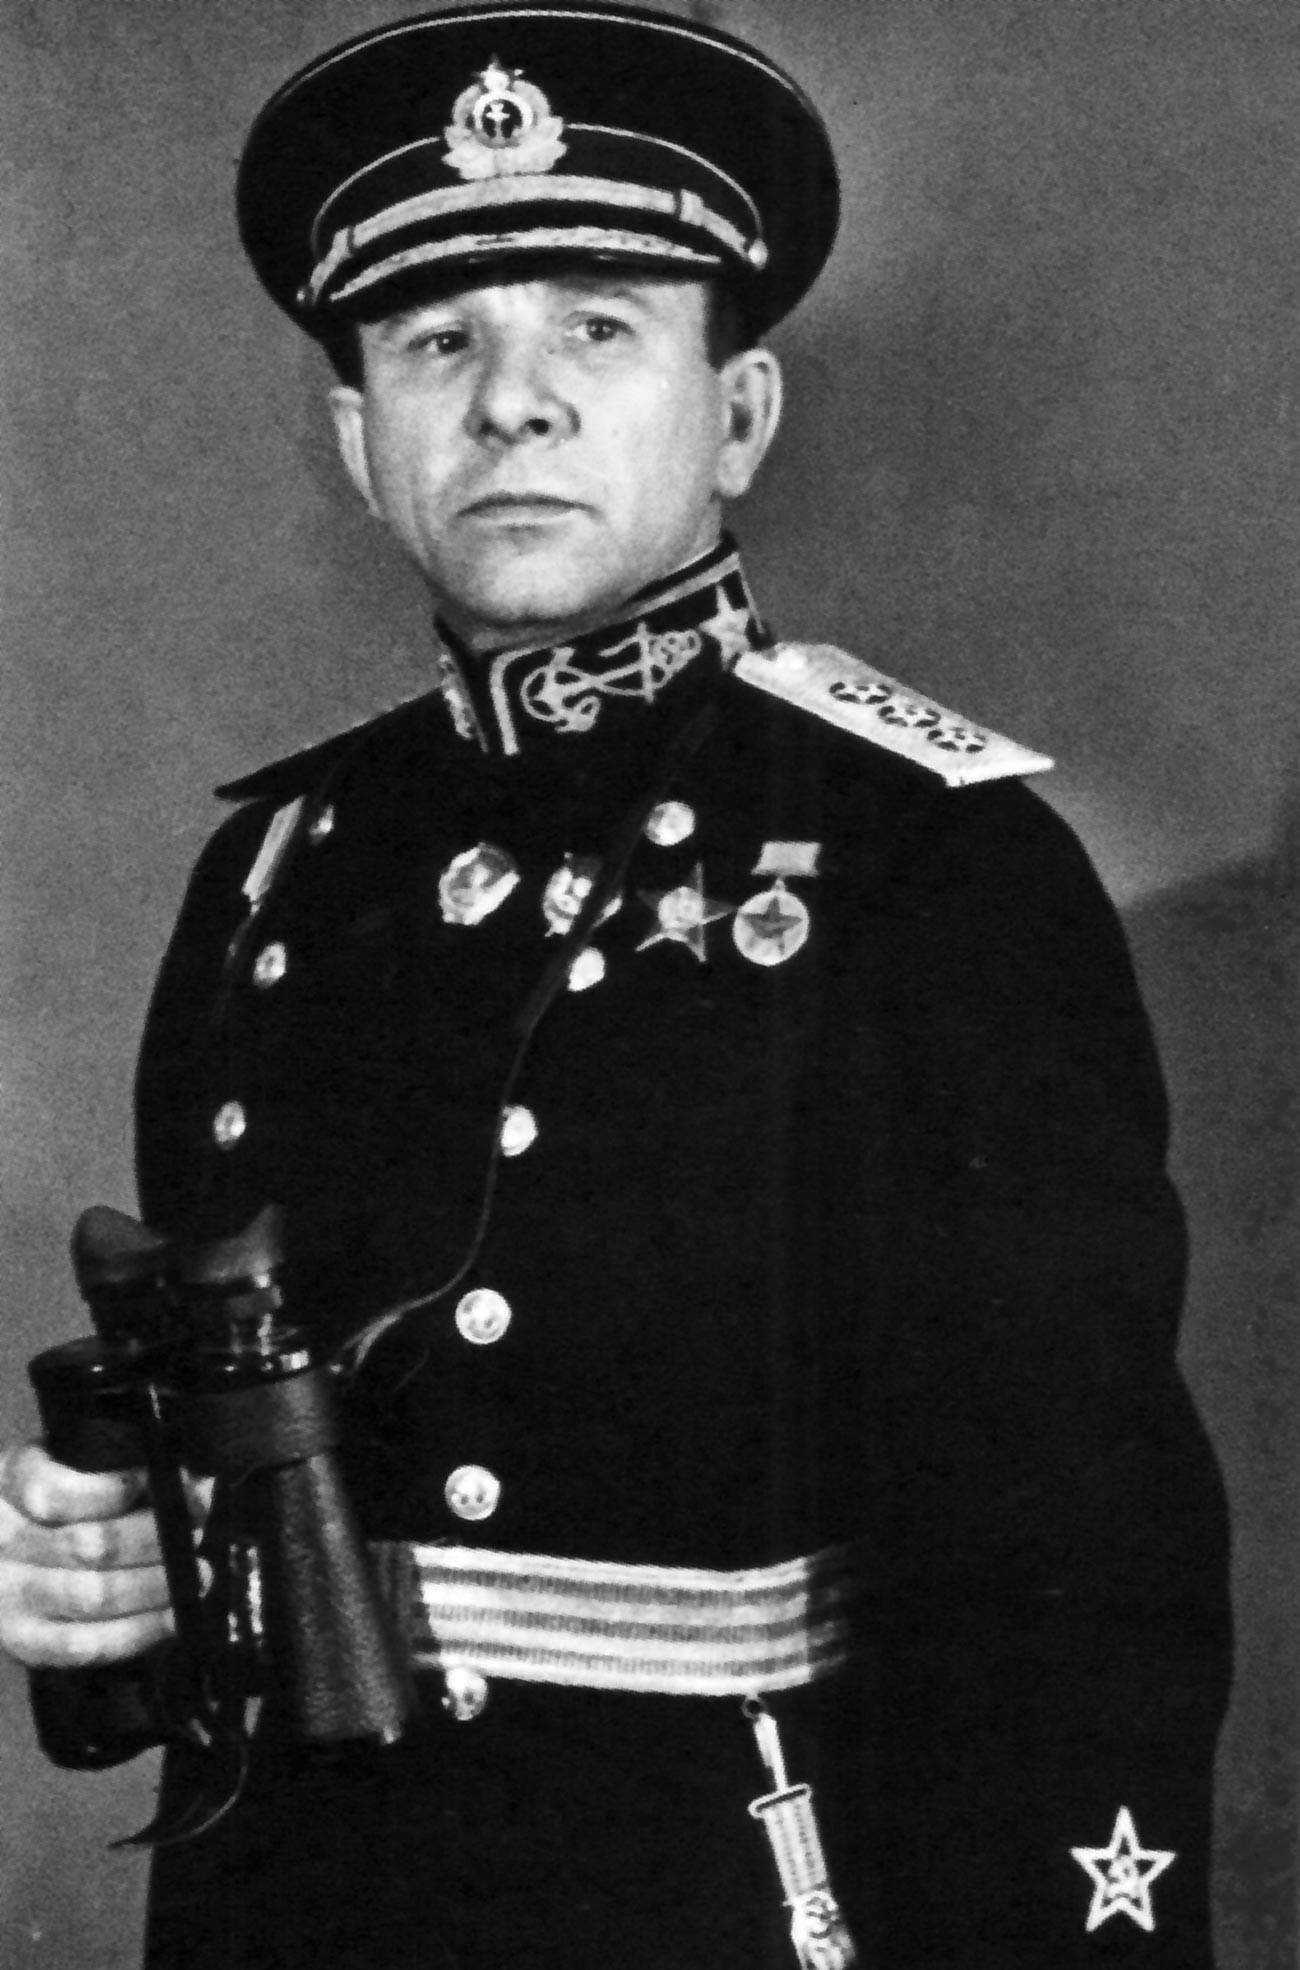 Il vice ammiraglio Vladimir Tributs (1900-1977)